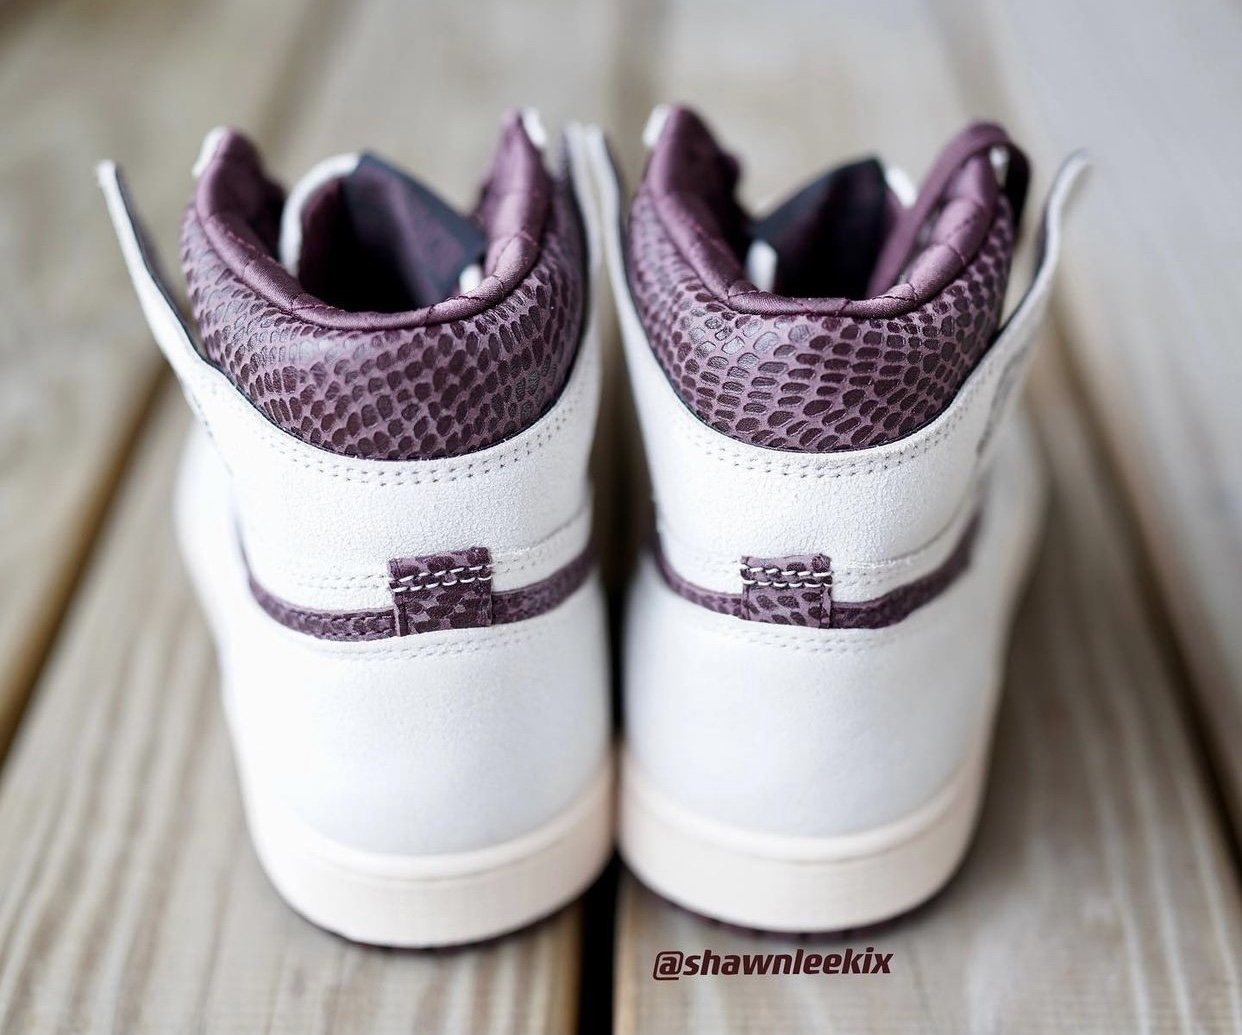 A Ma Maniere Air Jordan 1 High OG Release Details